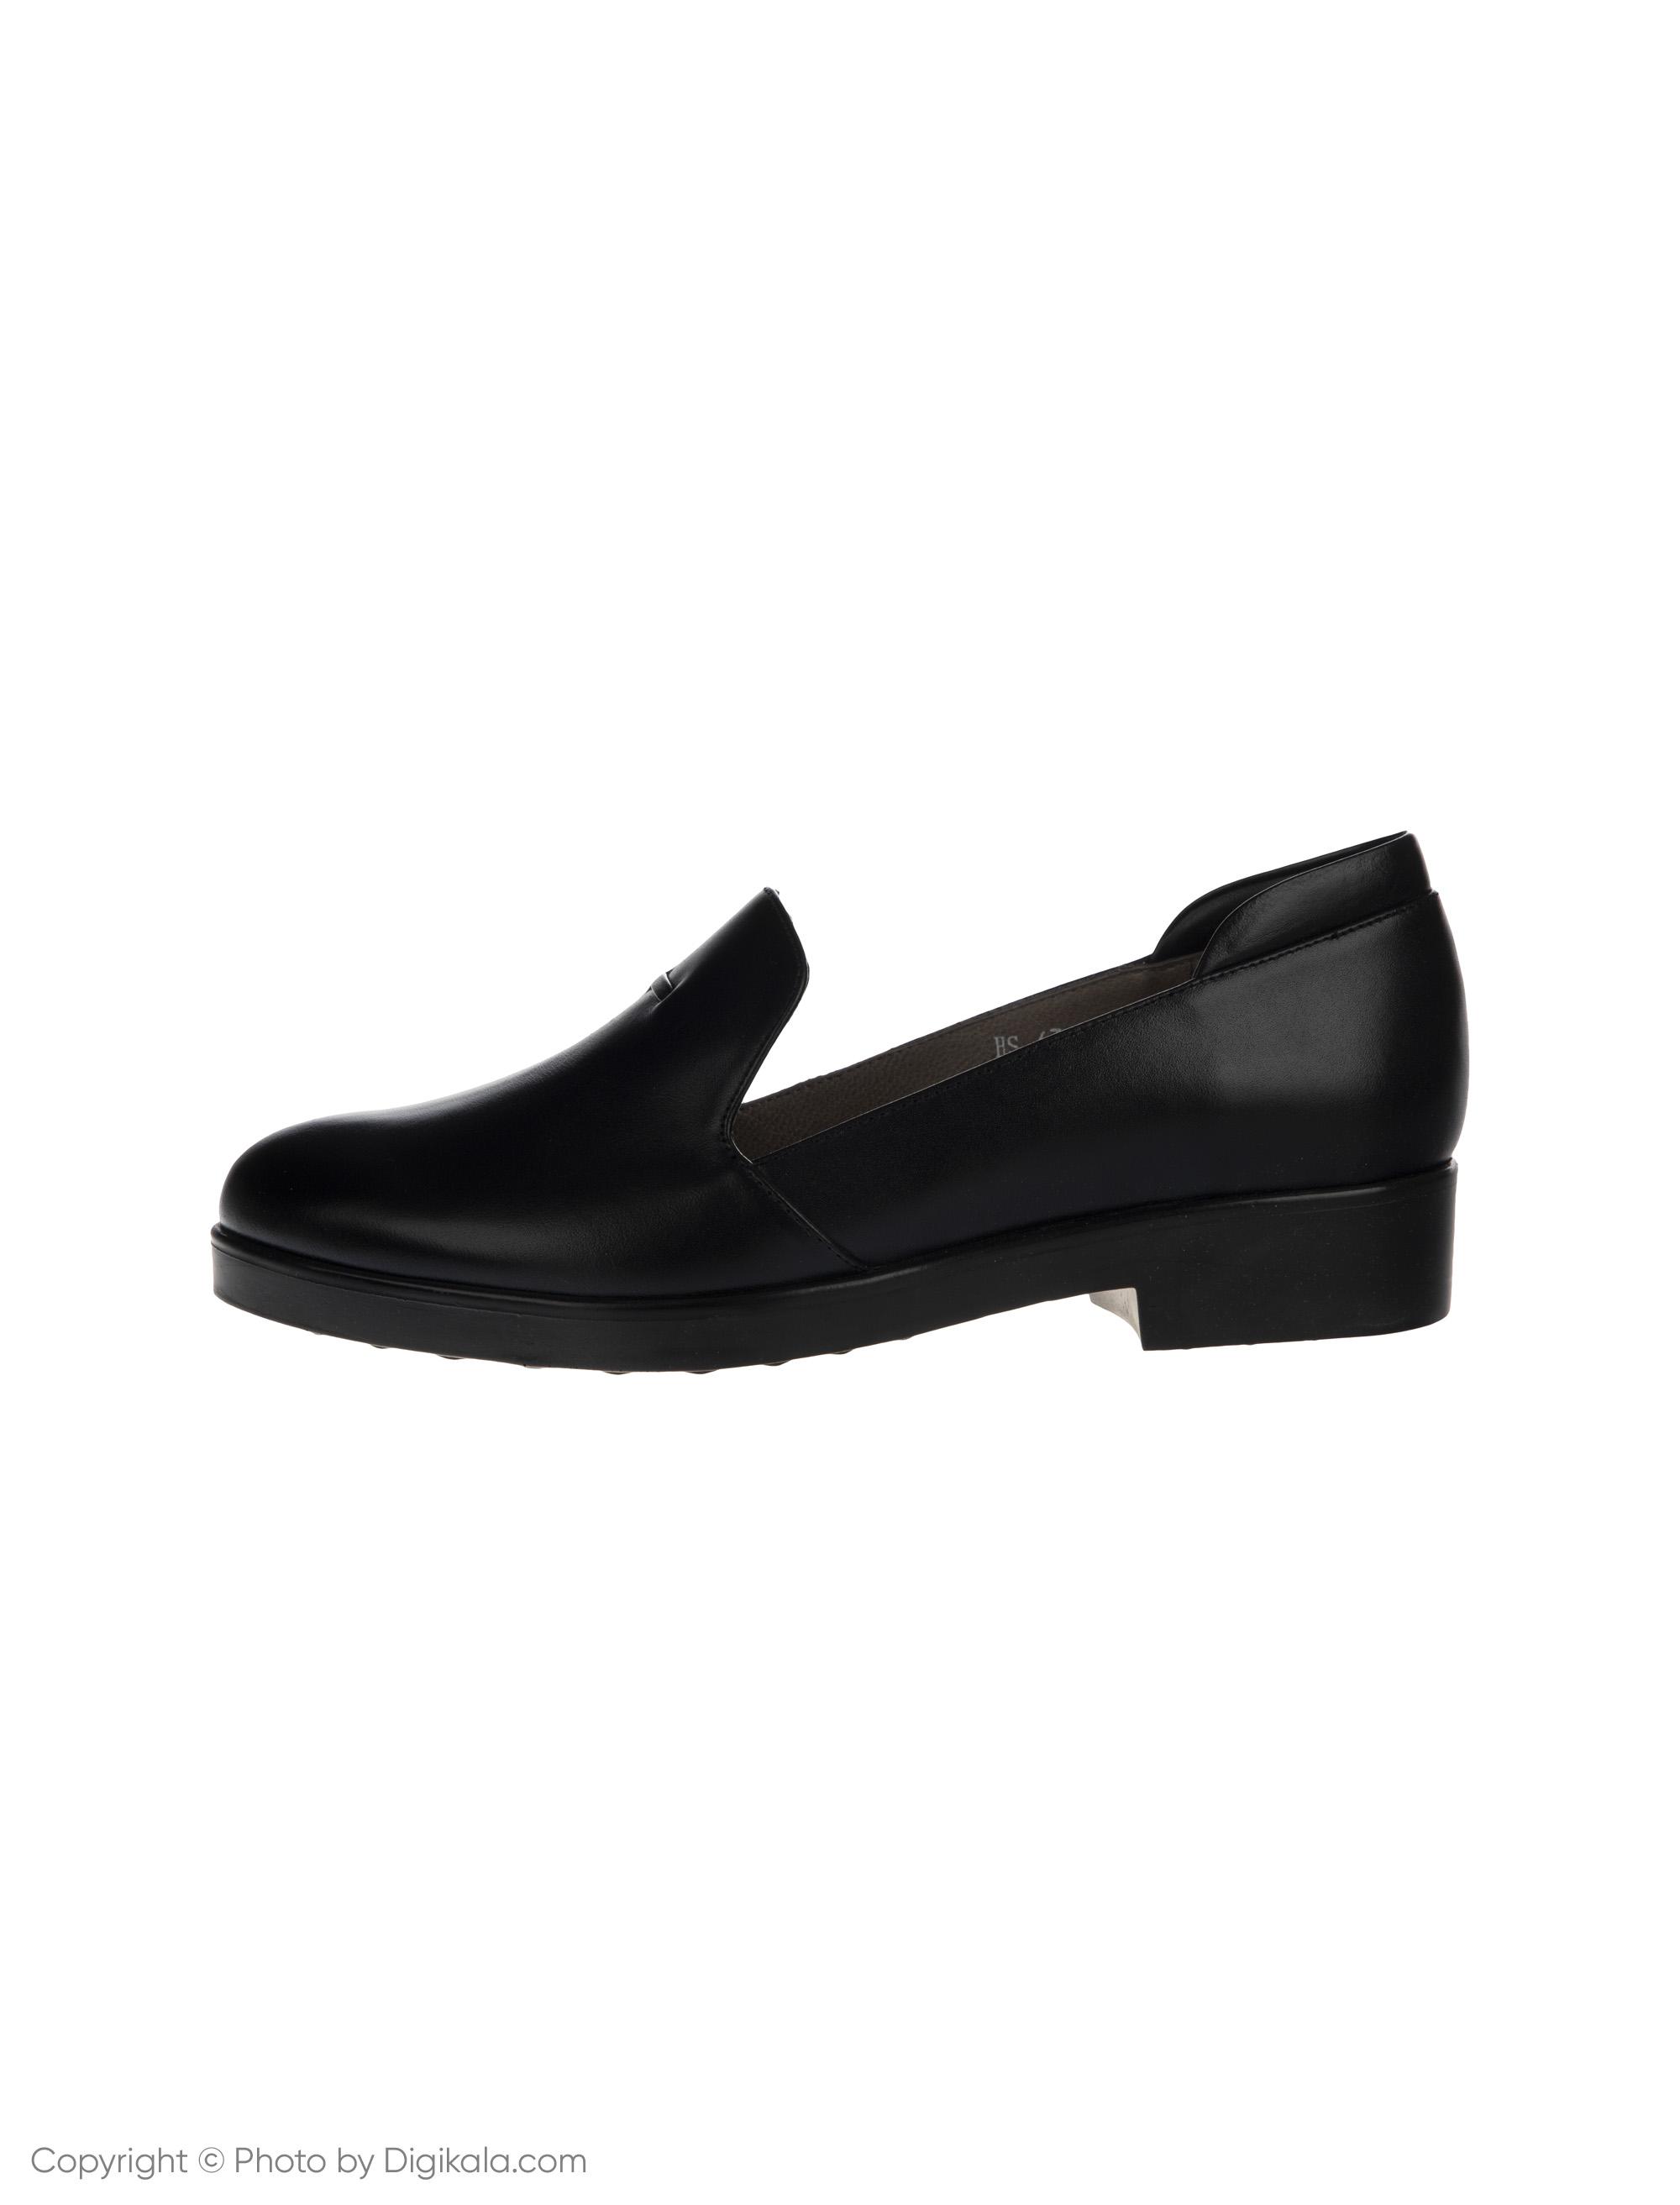 کفش روزمره زنانه شیفر مدل 5190A-101 -  - 1